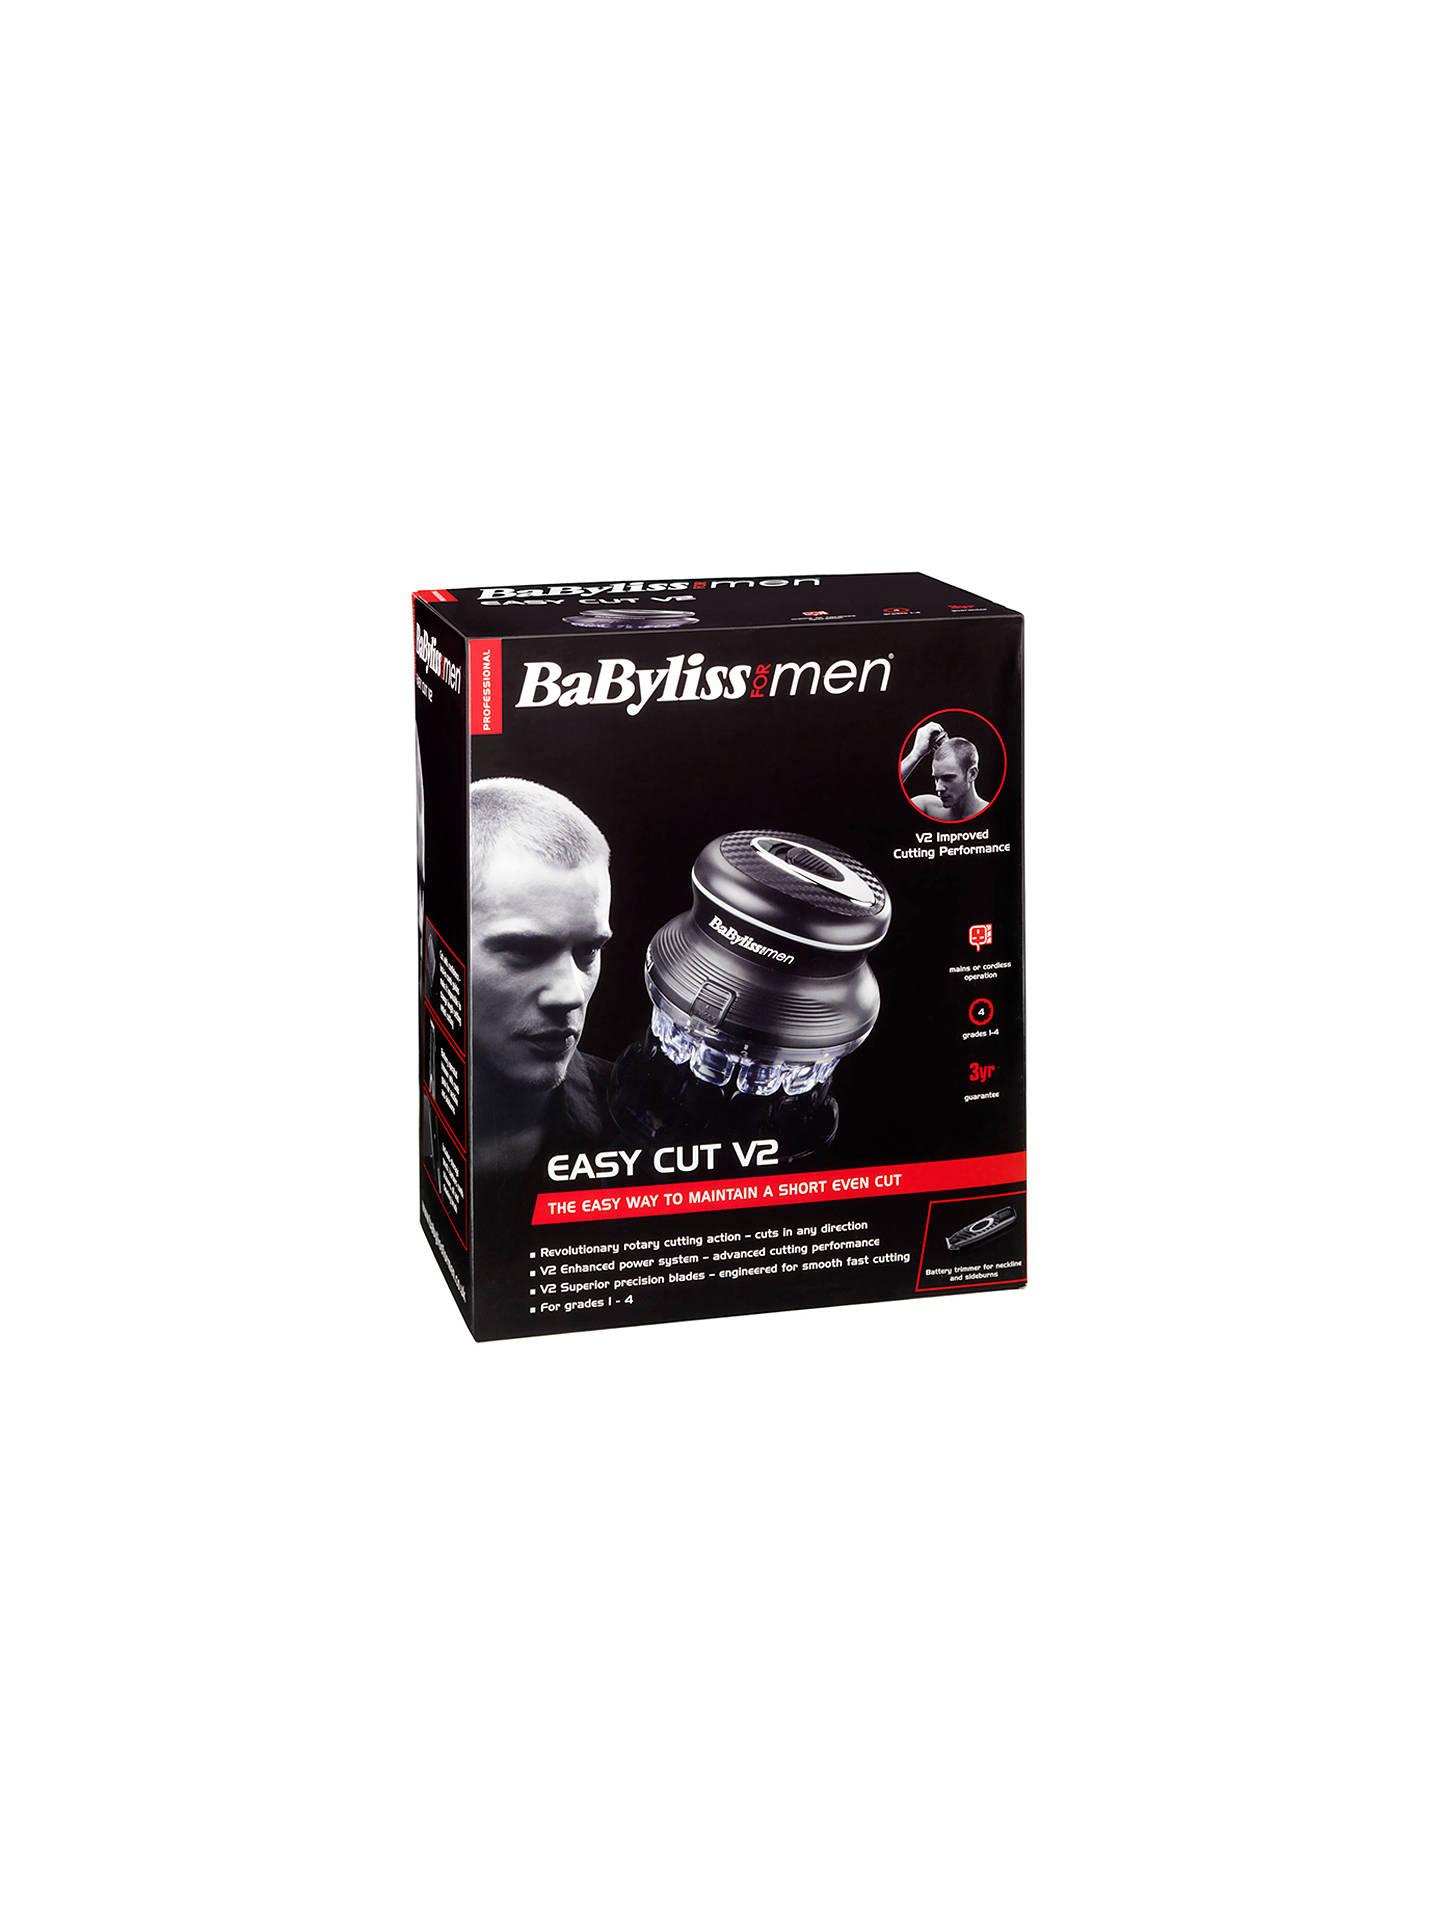 BaByliss For Men 10U Easy Cut Clipper Set at John Lewis & Partners